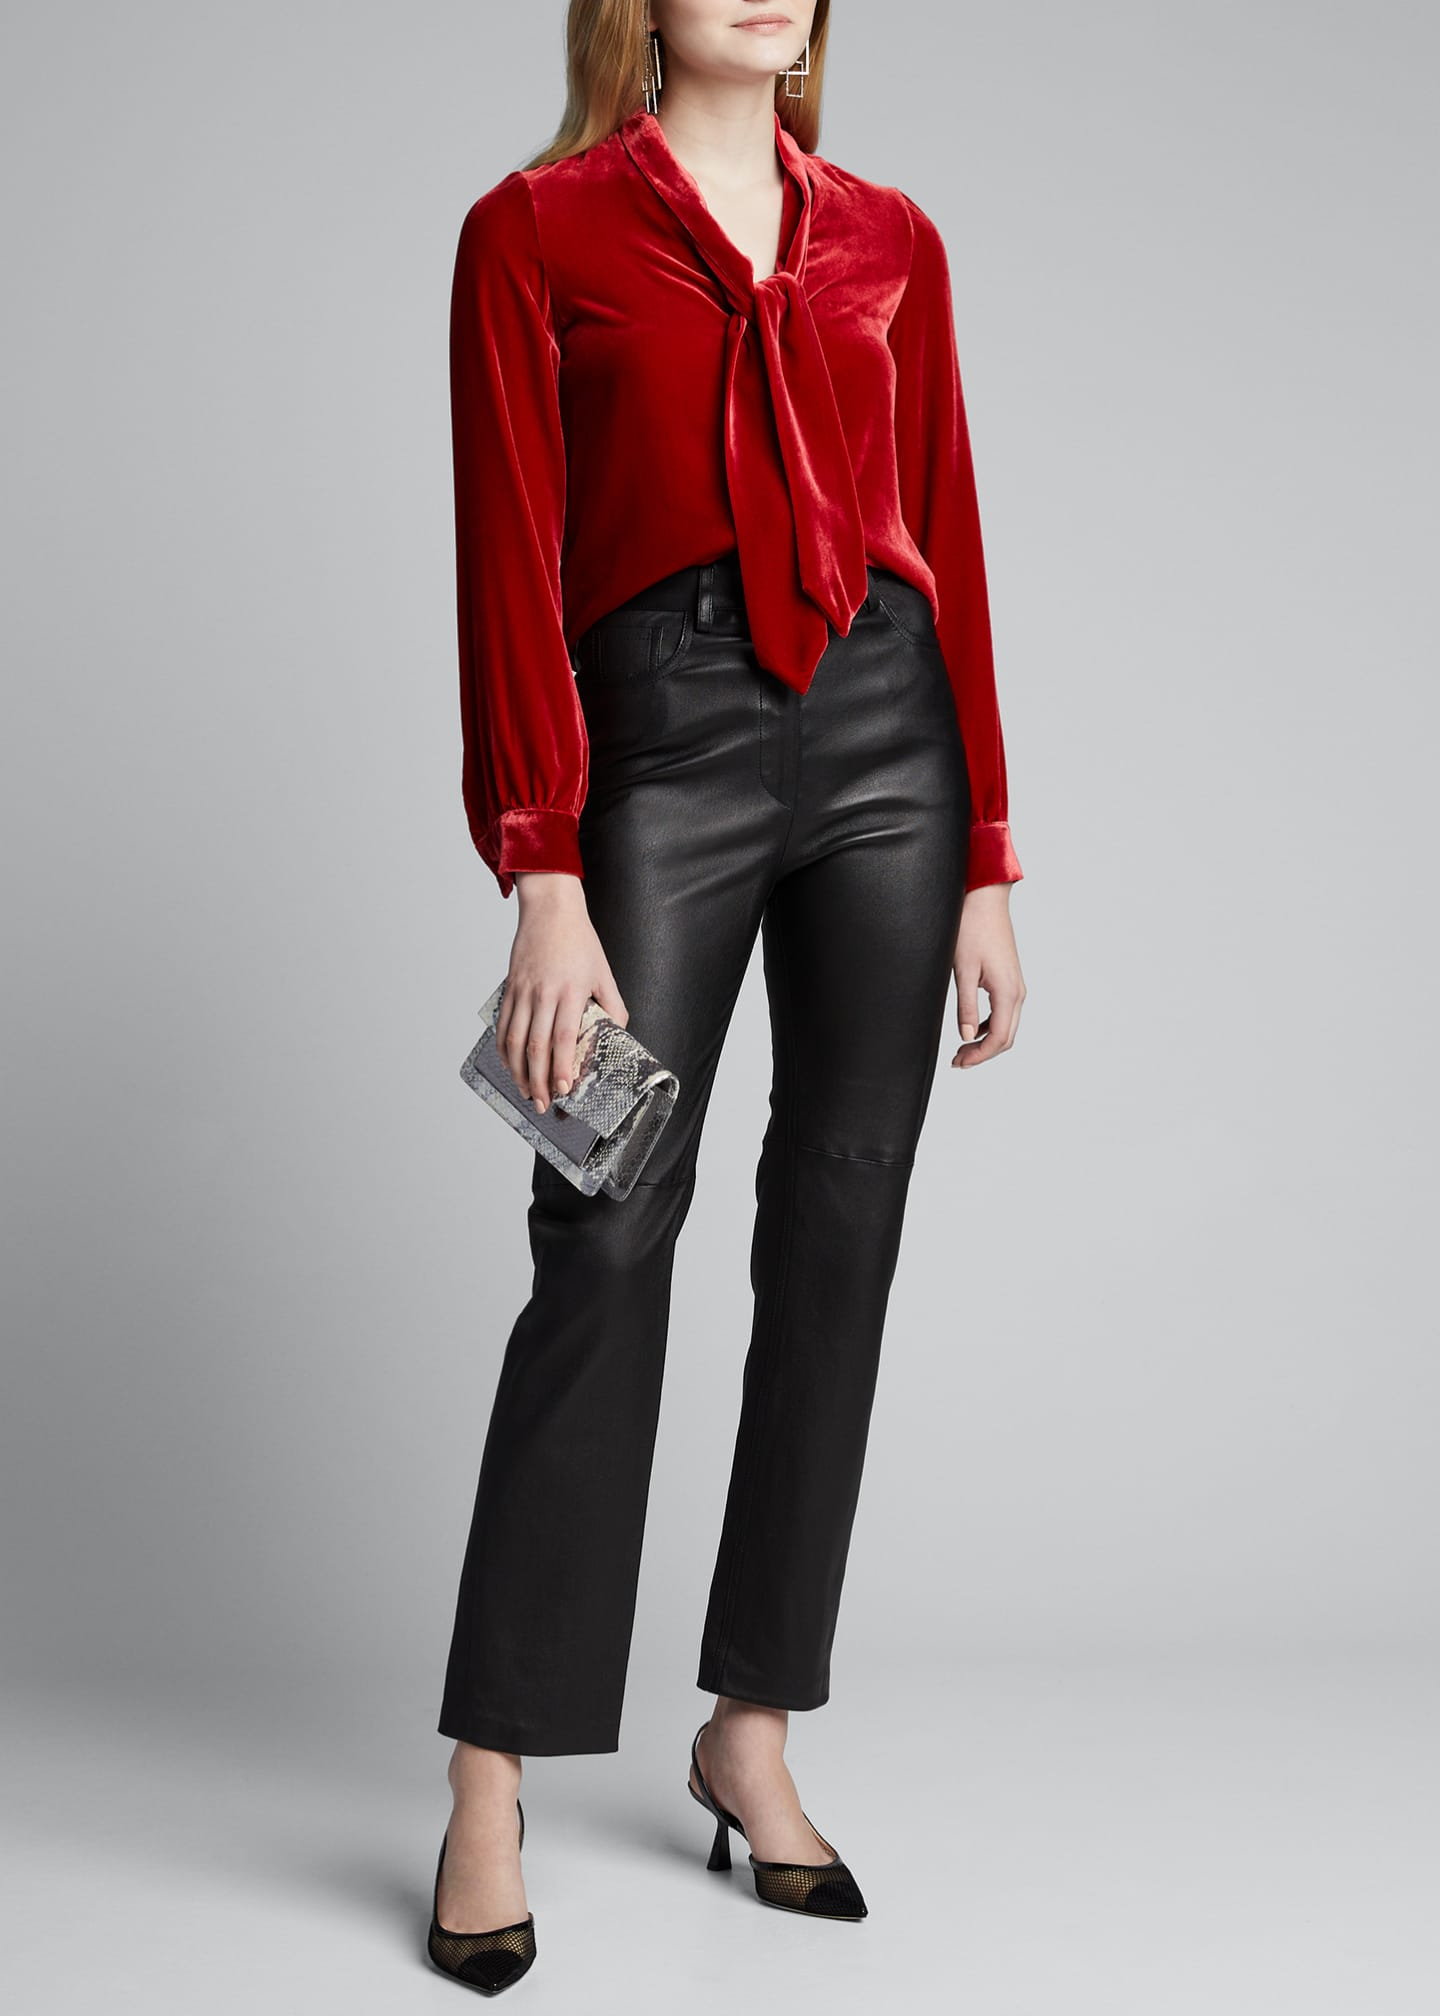 L'Agence Gisele Tie-Neck Velvet Button-Down Blouse